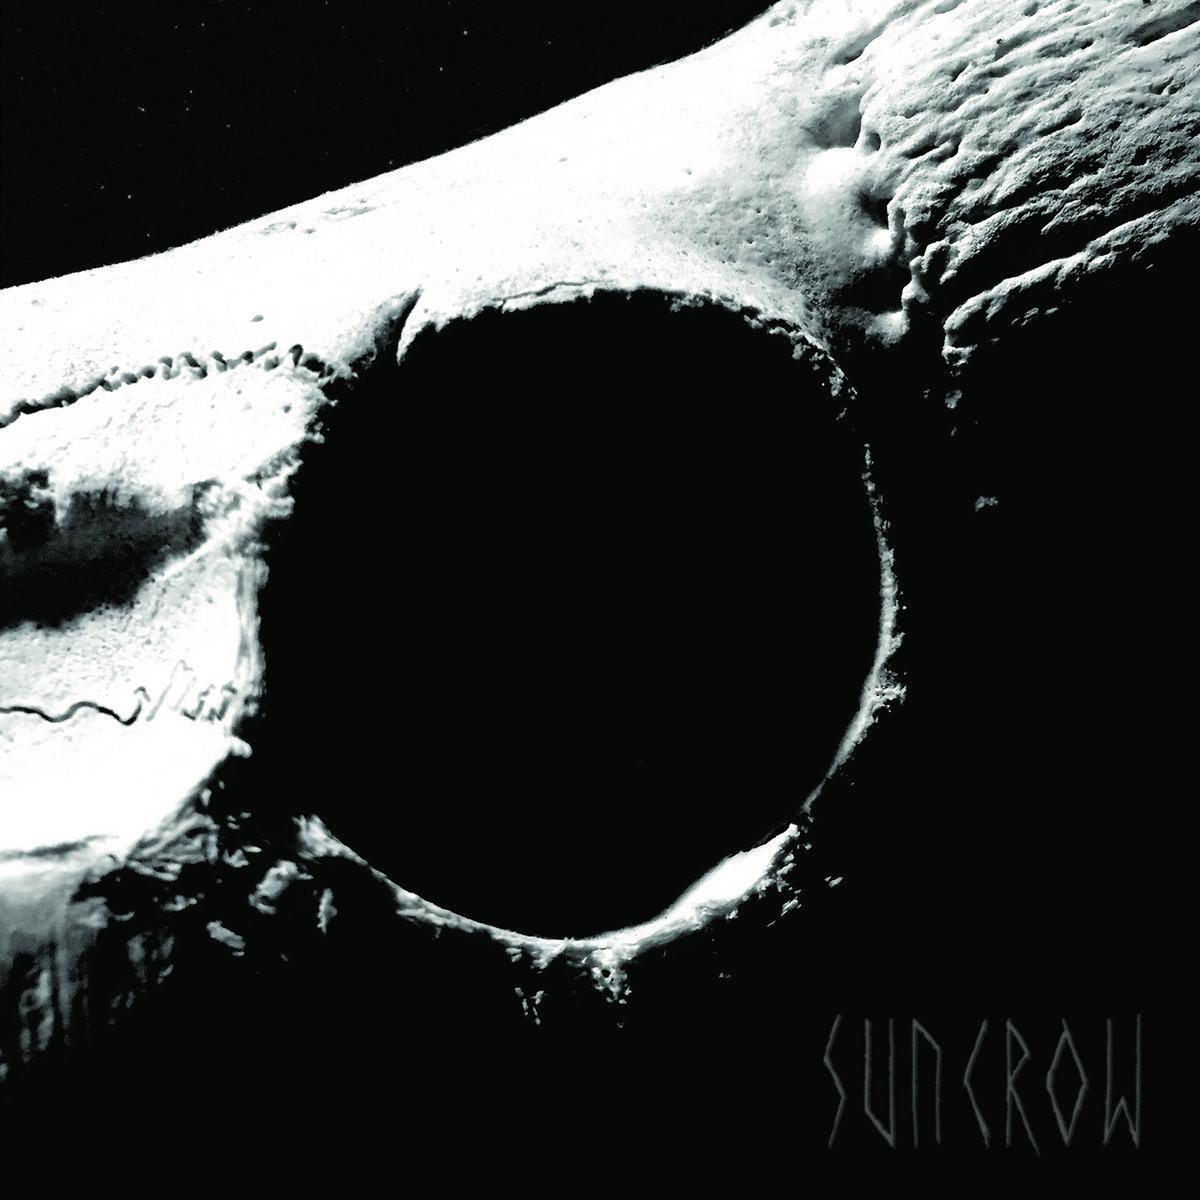 Quest for Oblivion   Sun Crow   Ripple Music